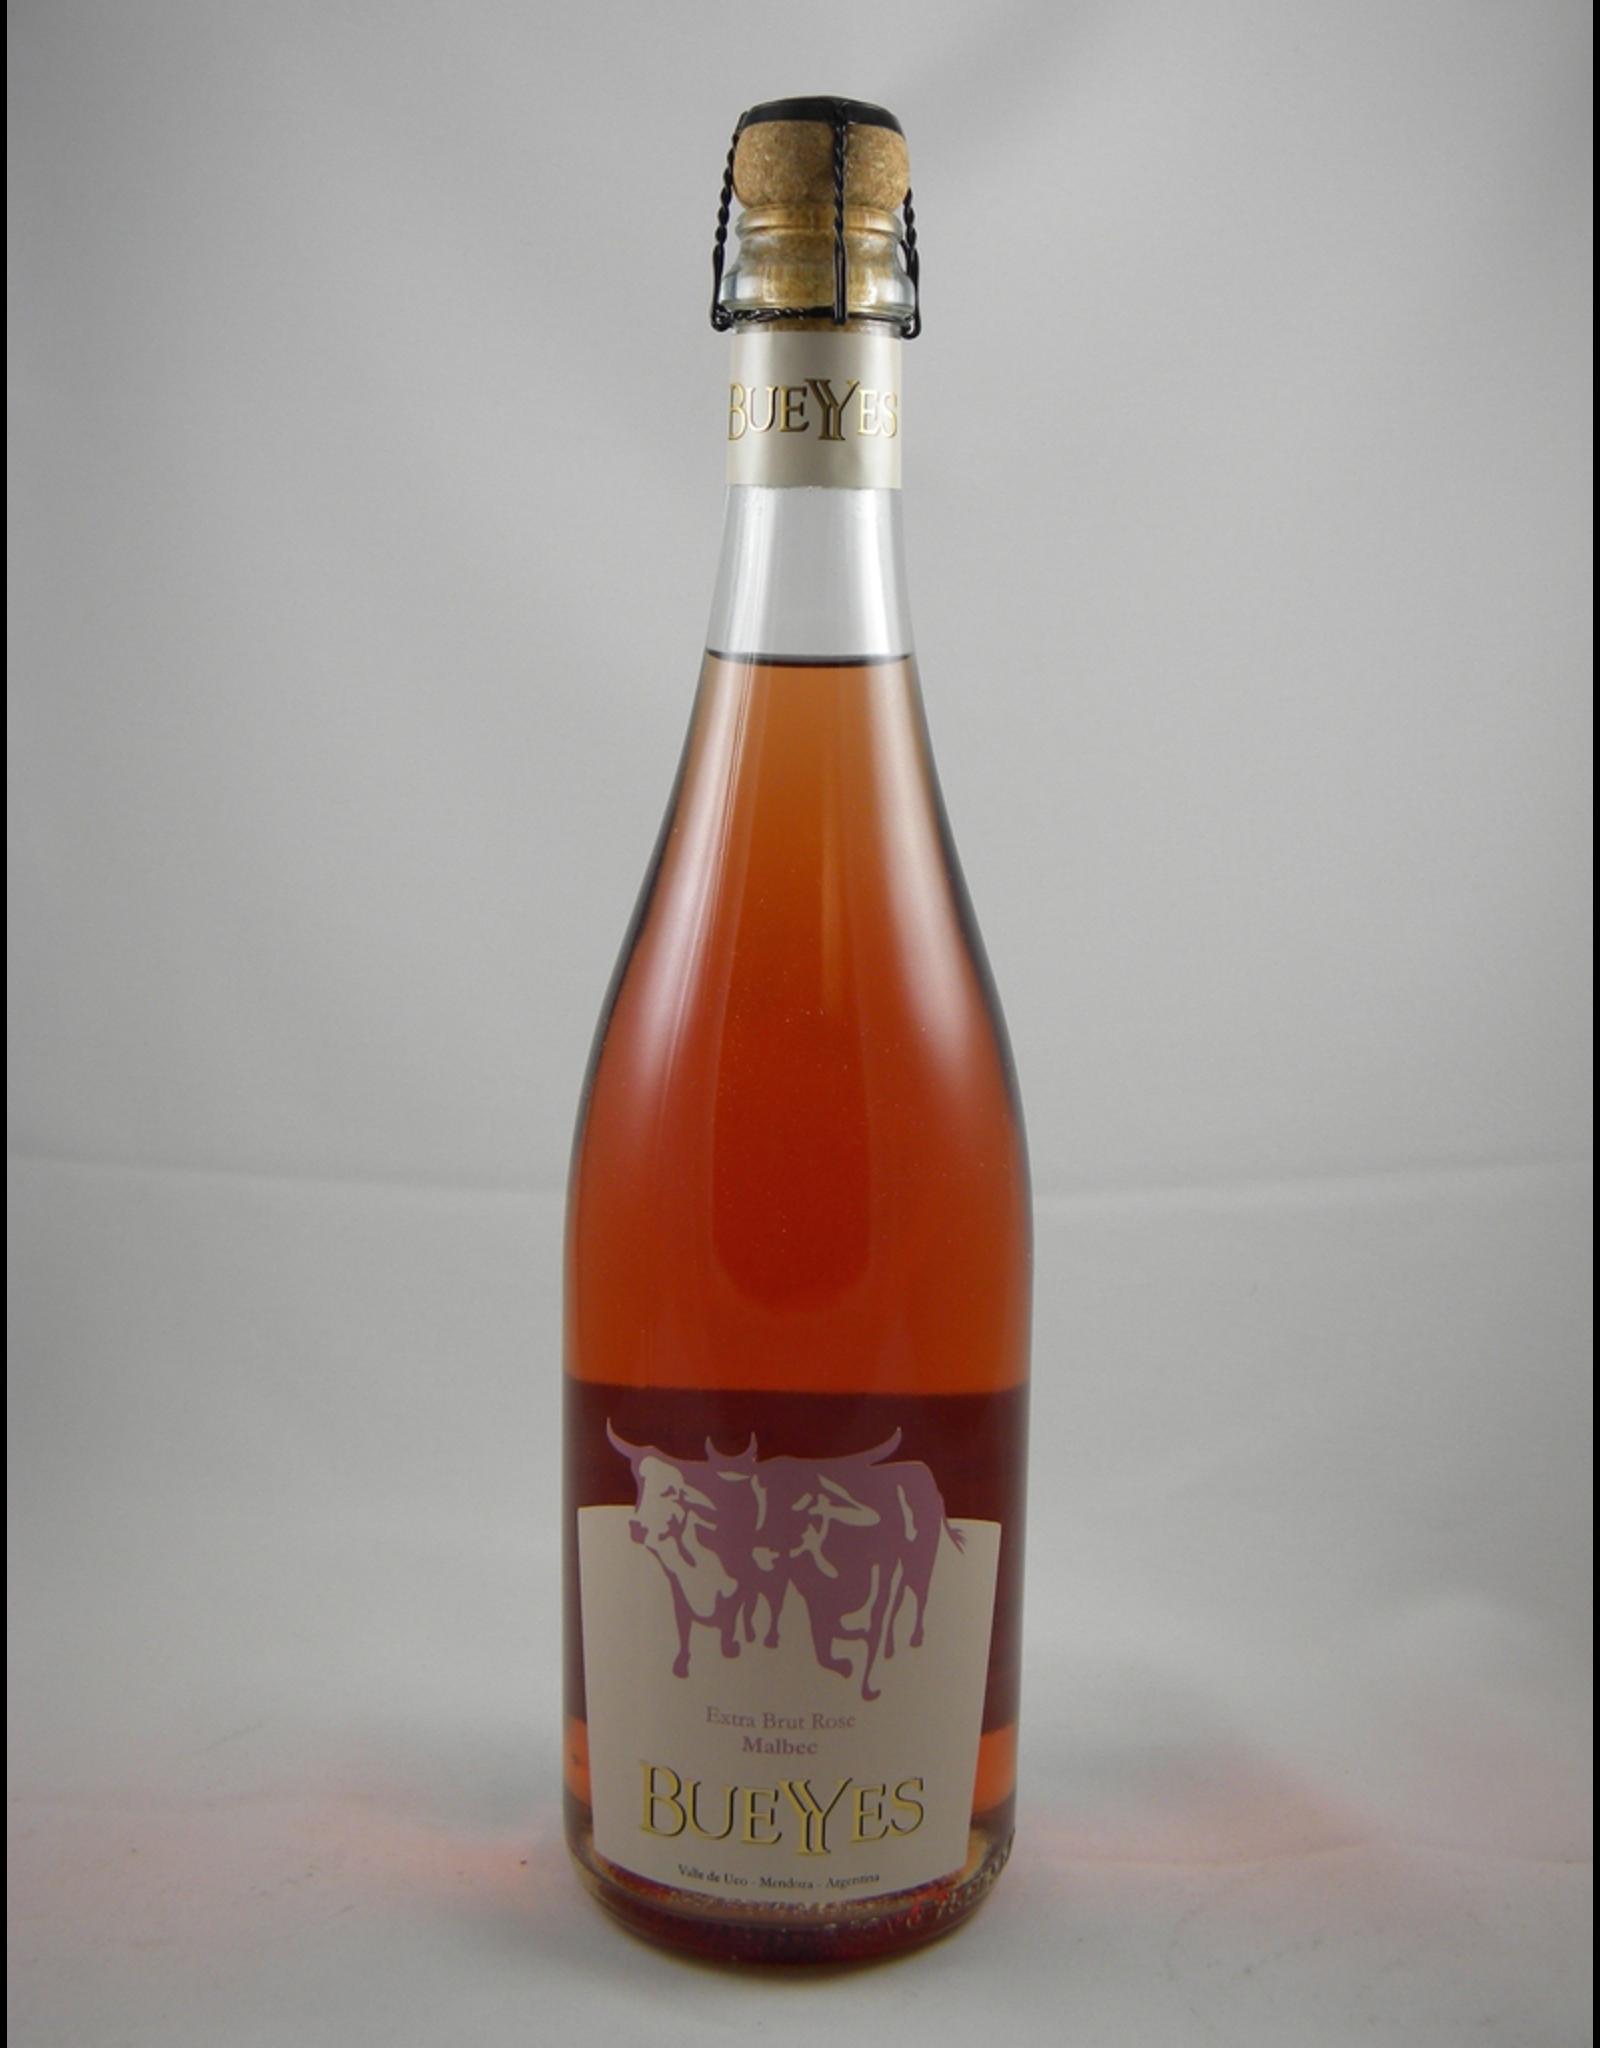 Bueyes Rosé Mendoza Extra Brut NV